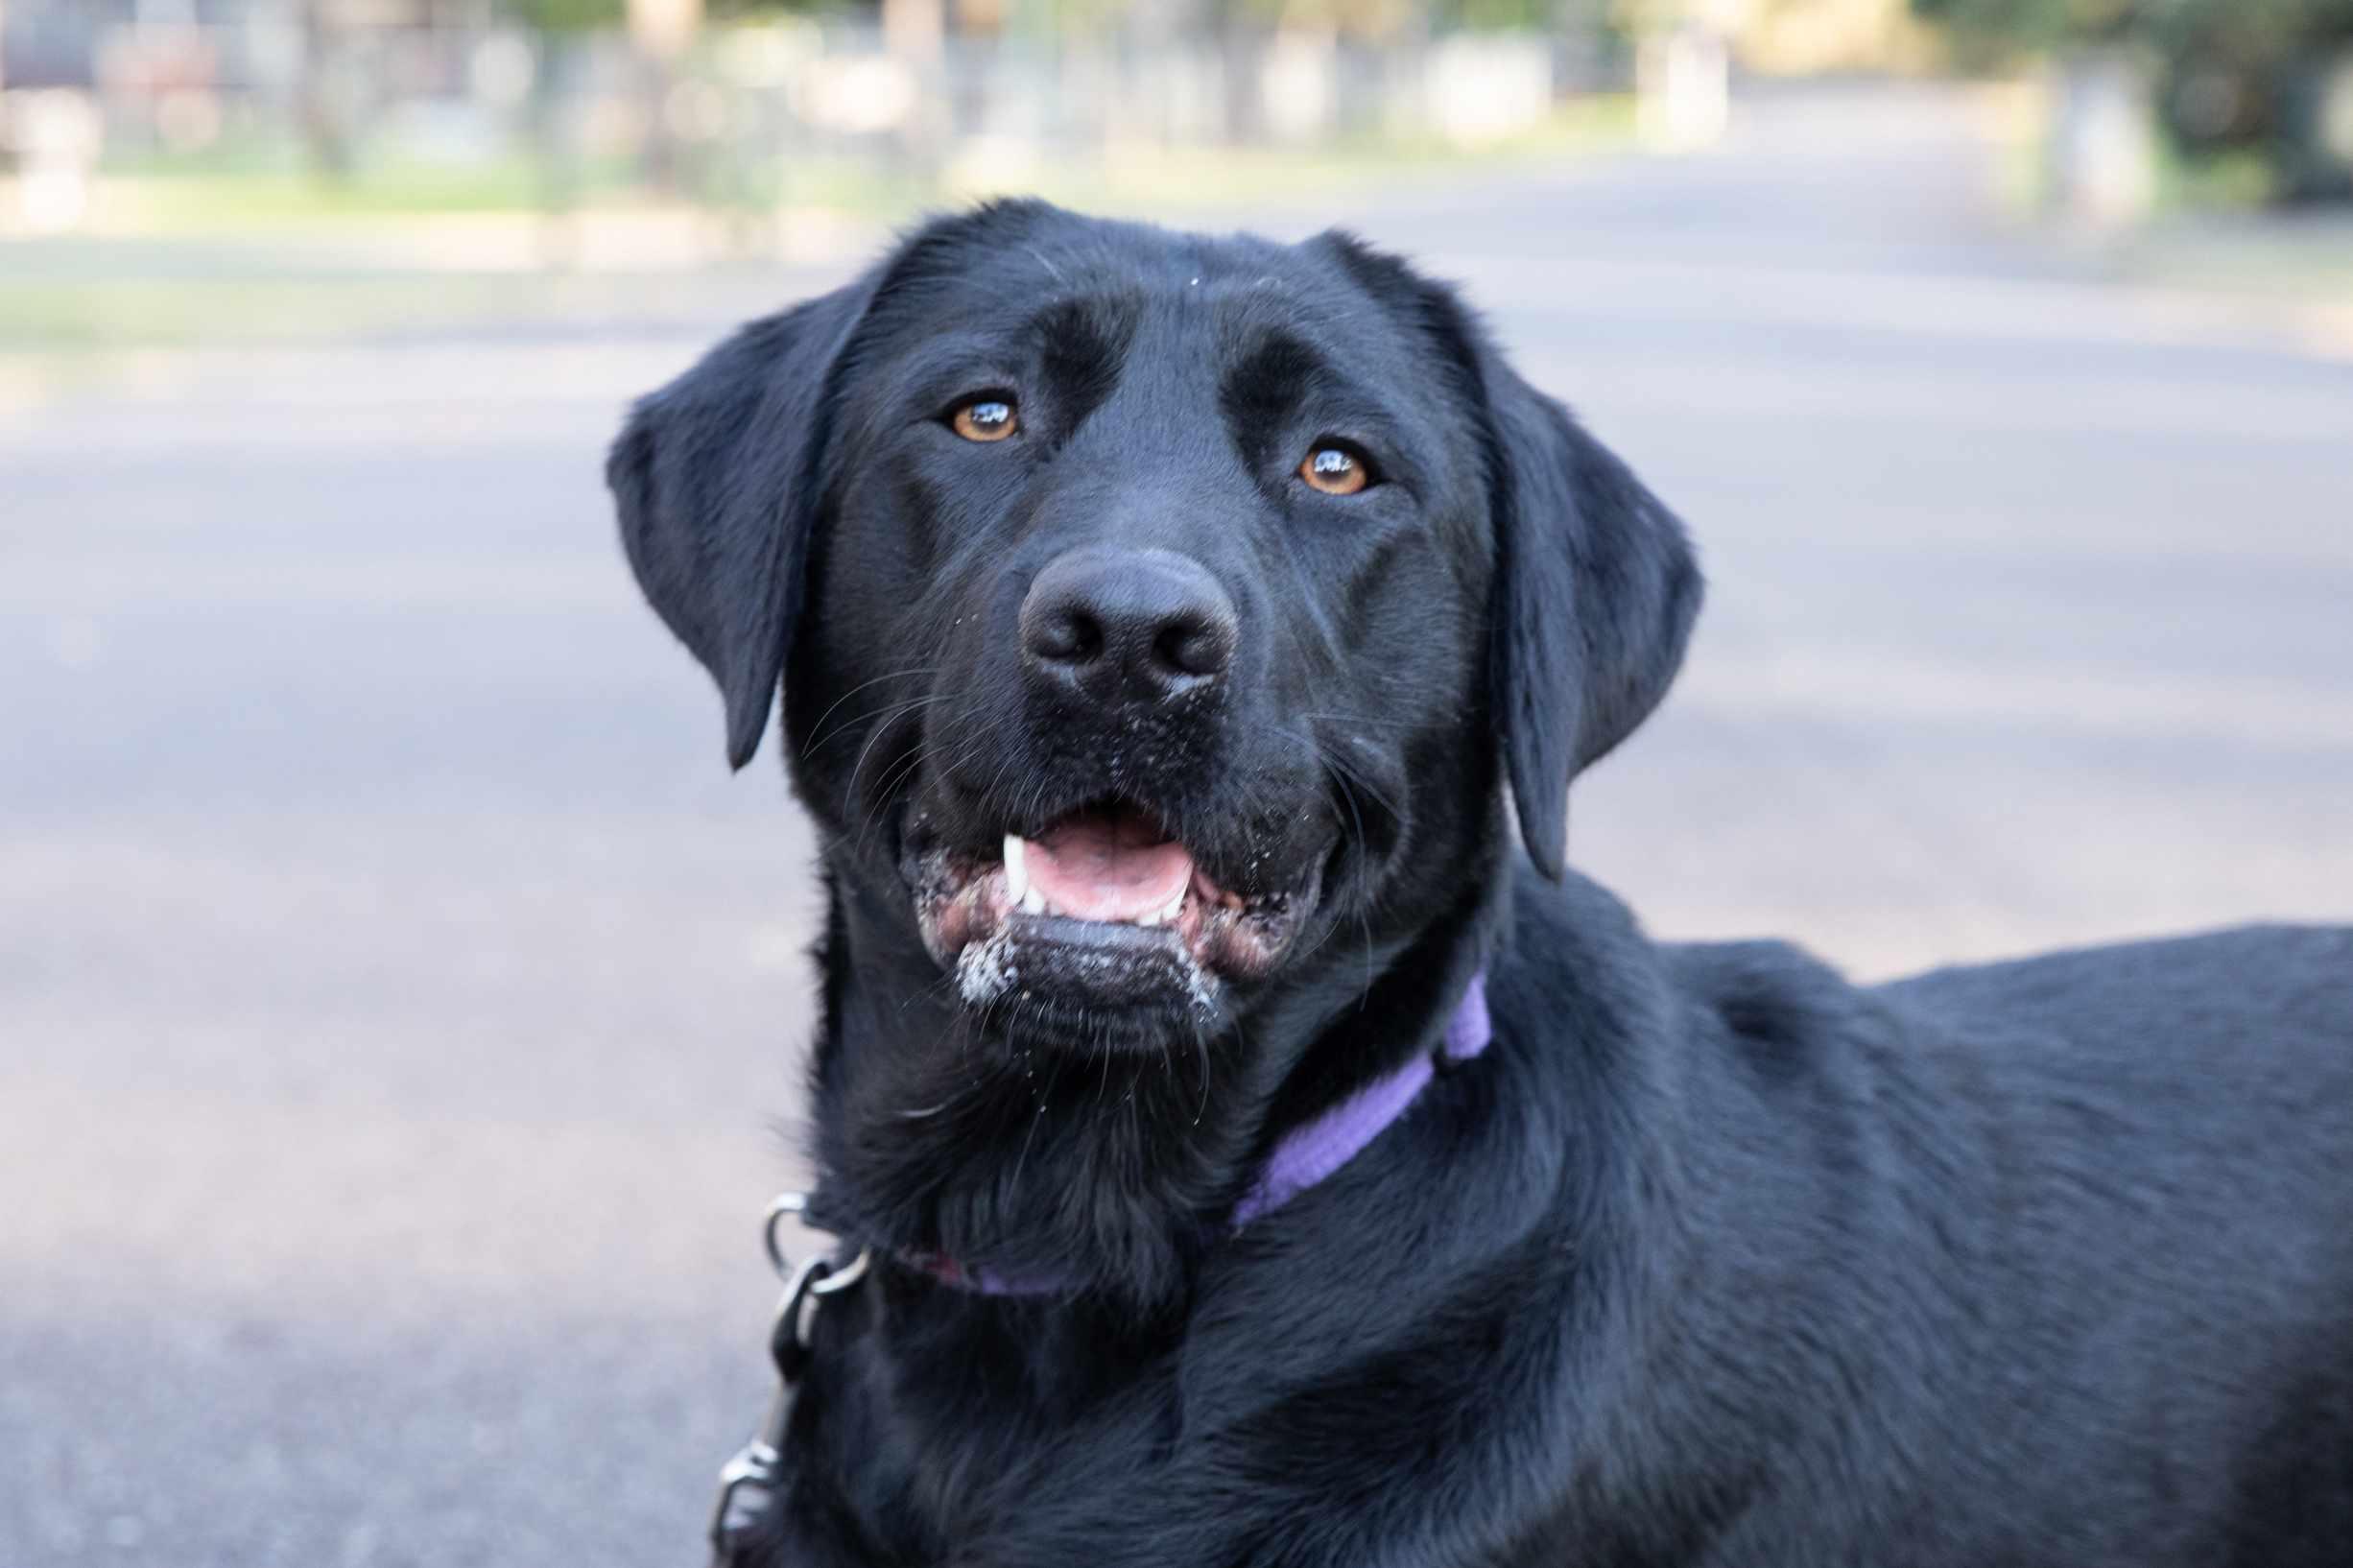 Black labrador retriever dog with purple collar and mouth open closeup